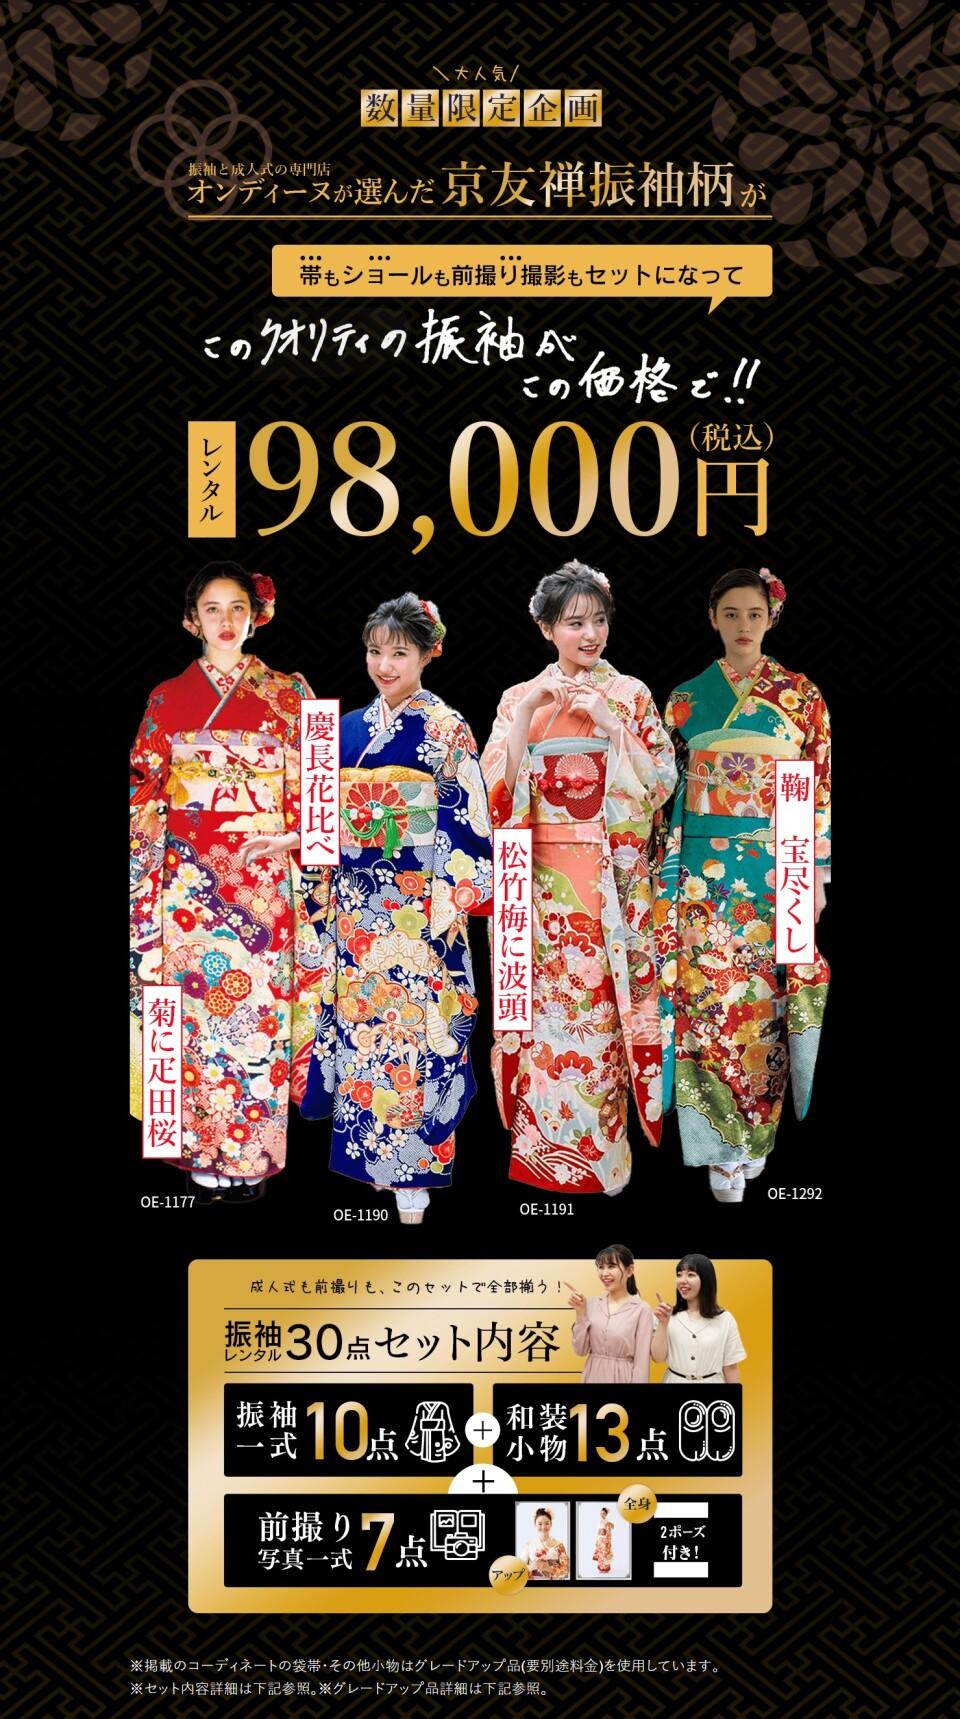 FireShot Capture 6404 - 振袖グランマルシェ|成人式の振袖レンタル・販売オンディーヌ - www.ondine.jp